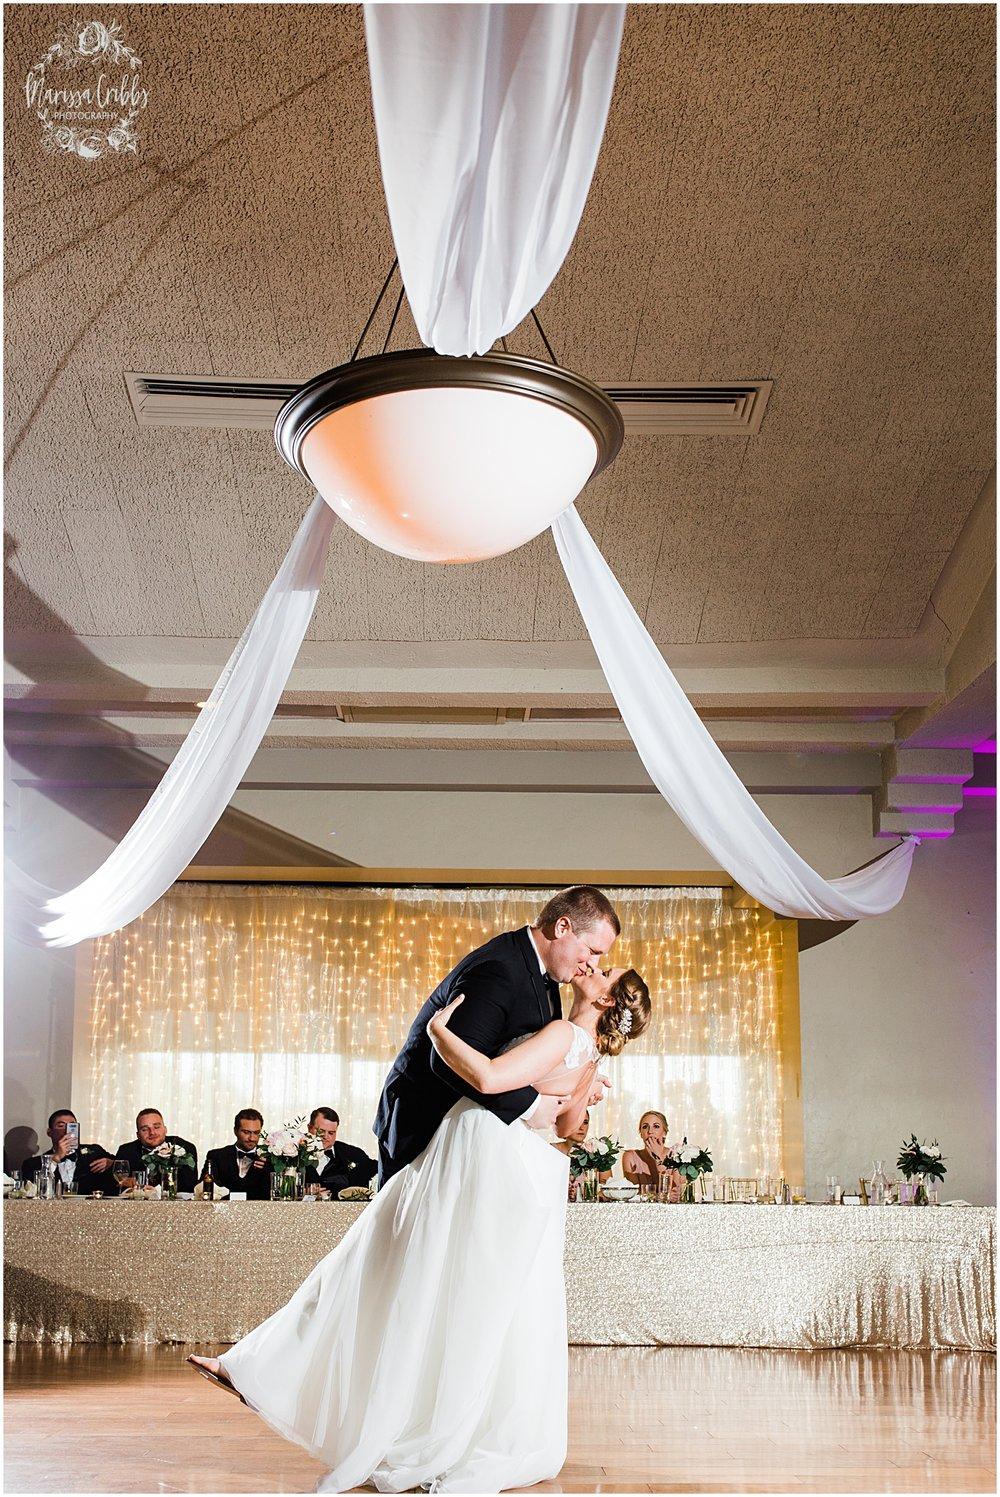 LAKE QUIVIRA COUNTRY CLUB WEDDING | MORGAN & RYAN | MARISSA CRIBBS PHOTOGRAPHY_5521.jpg